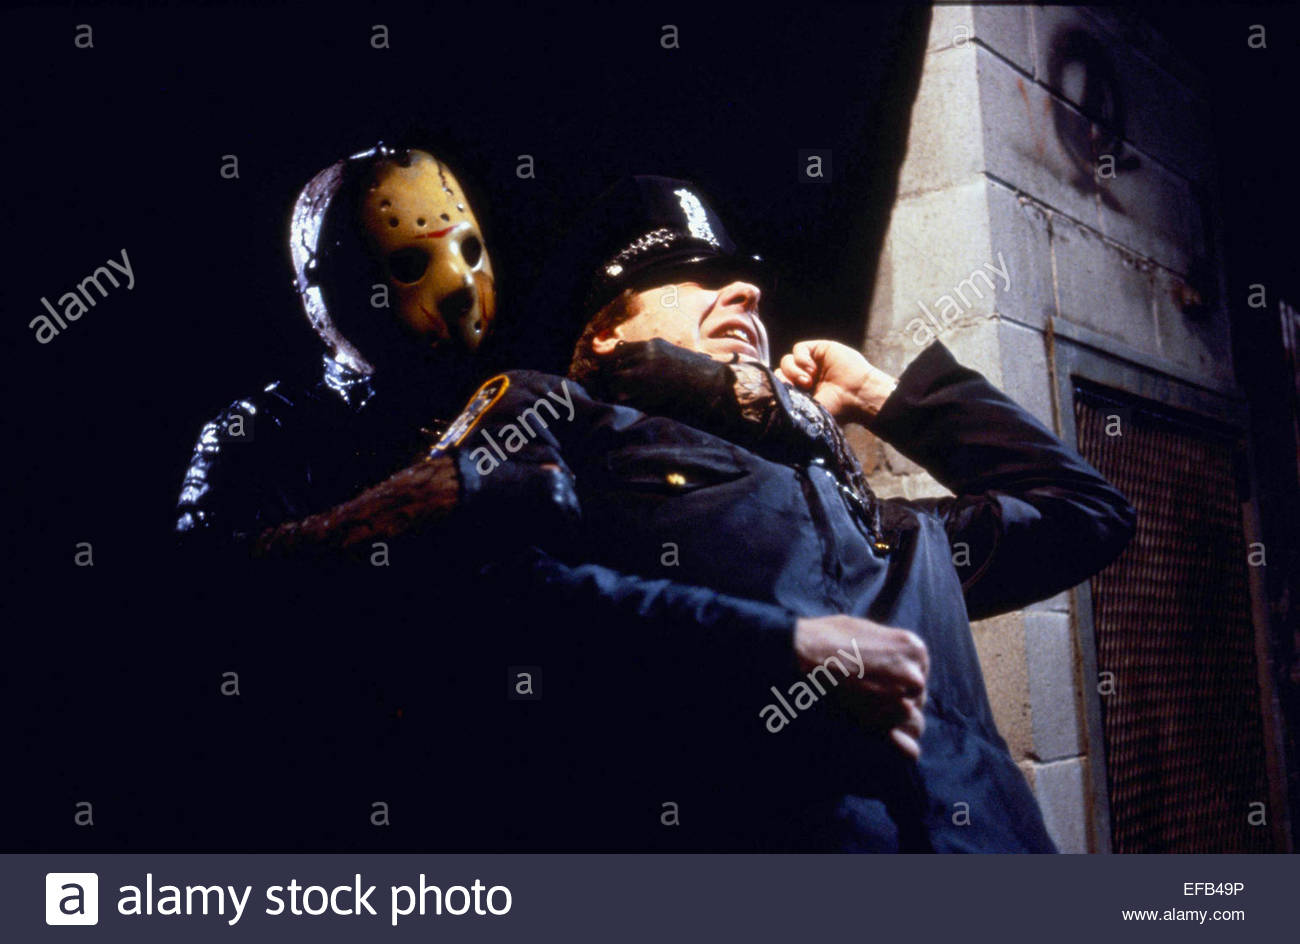 Most Viewed Friday The 13th Part Viii Jason Takes Manhattan